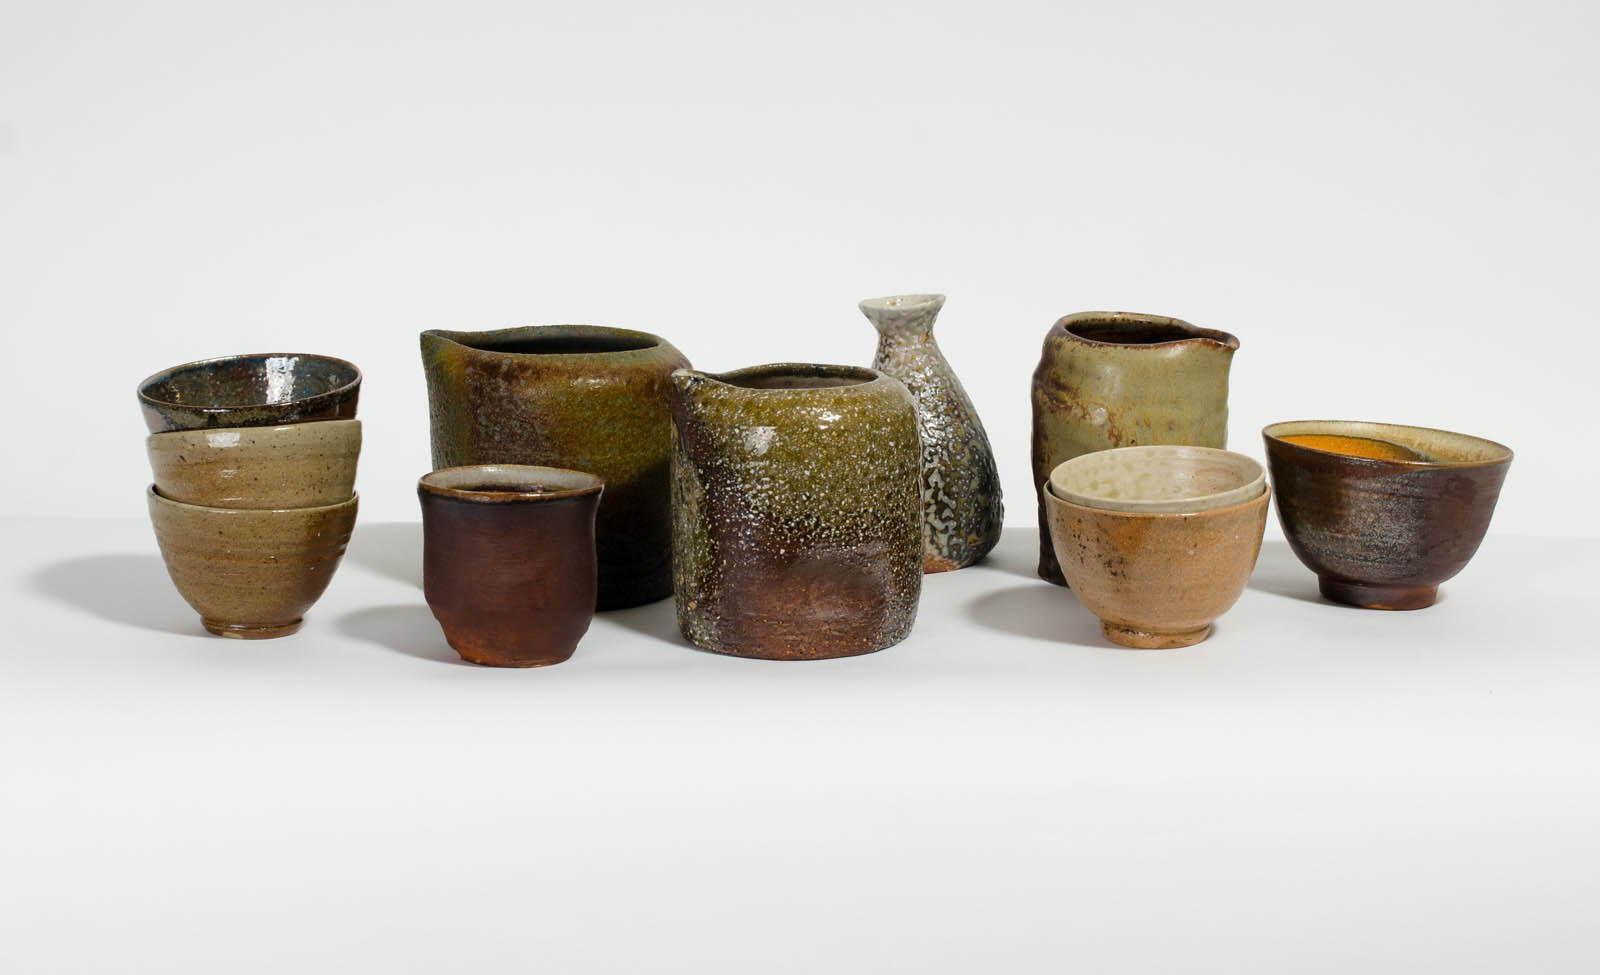 Shop Handmade Ceramics - Online at Modern Archive Berlin